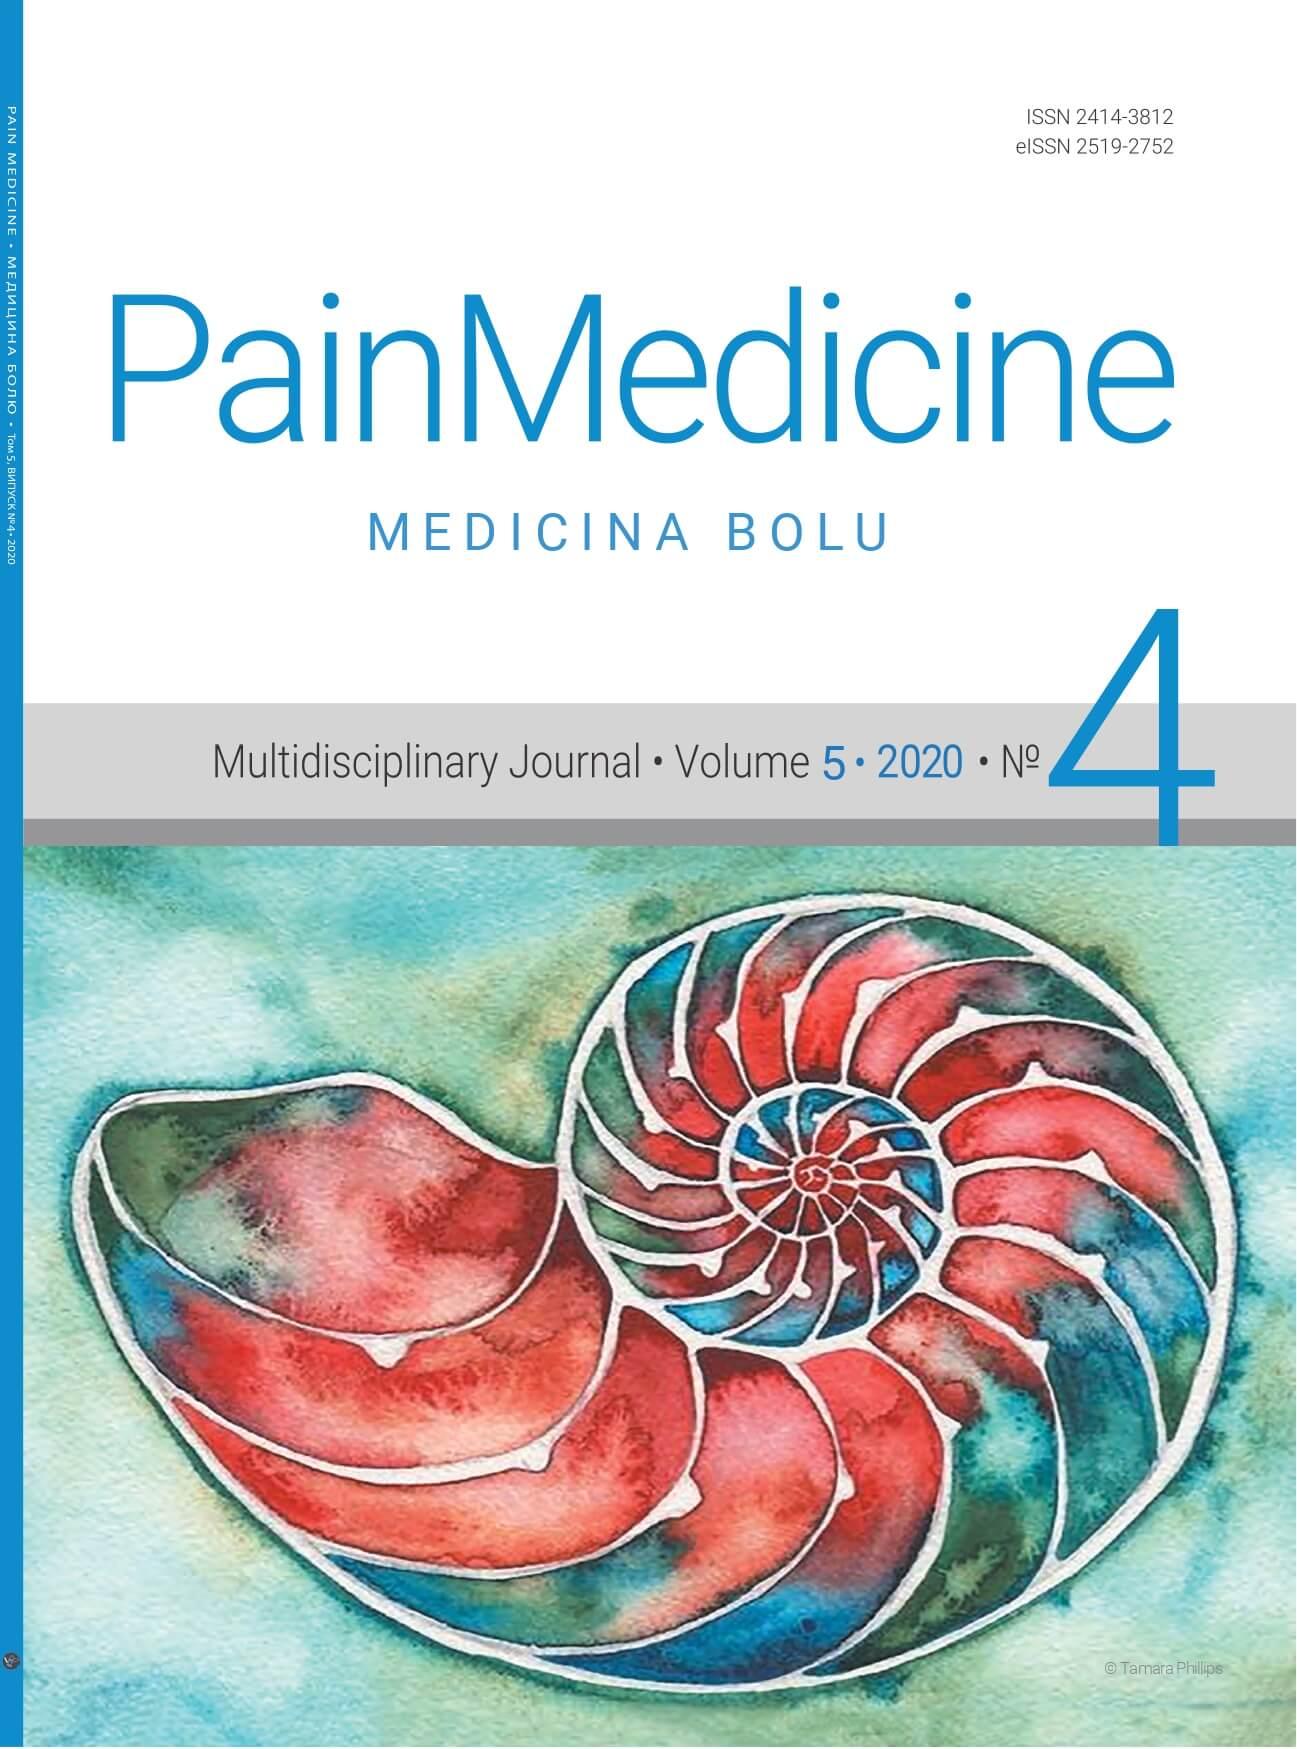 Pain Medicine №4 2020 volume 5